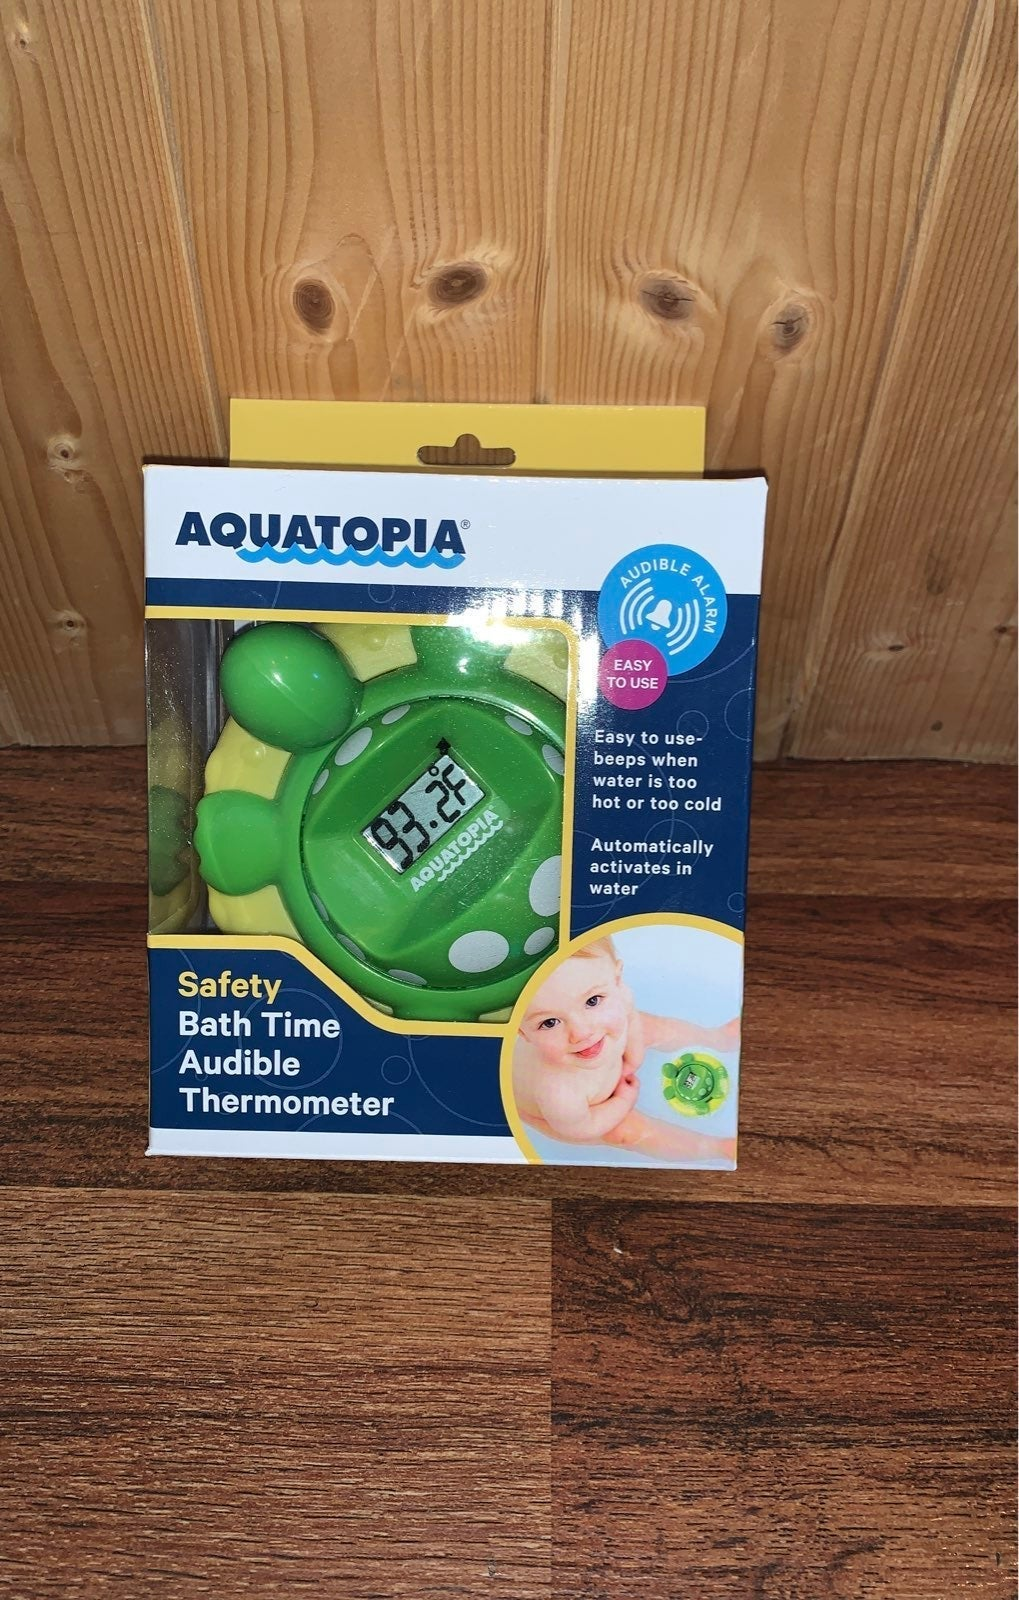 Aquatopia Satefy Bath Thermometer